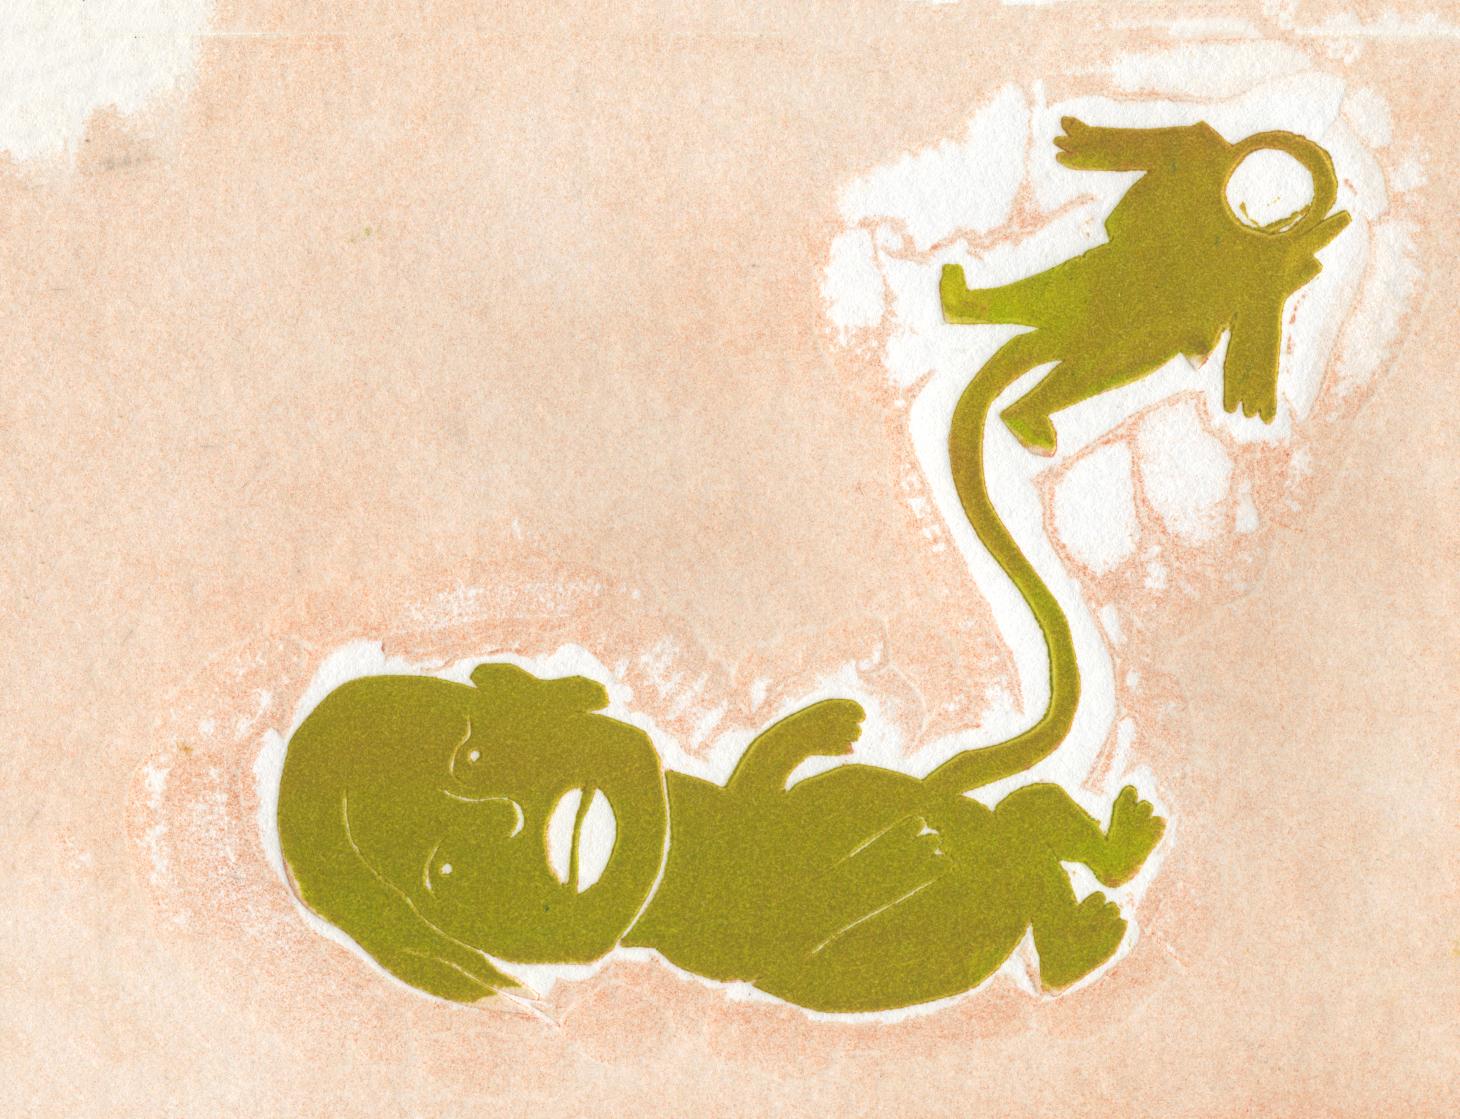 Birth Of An Astronaut, 2013, linoleum block print